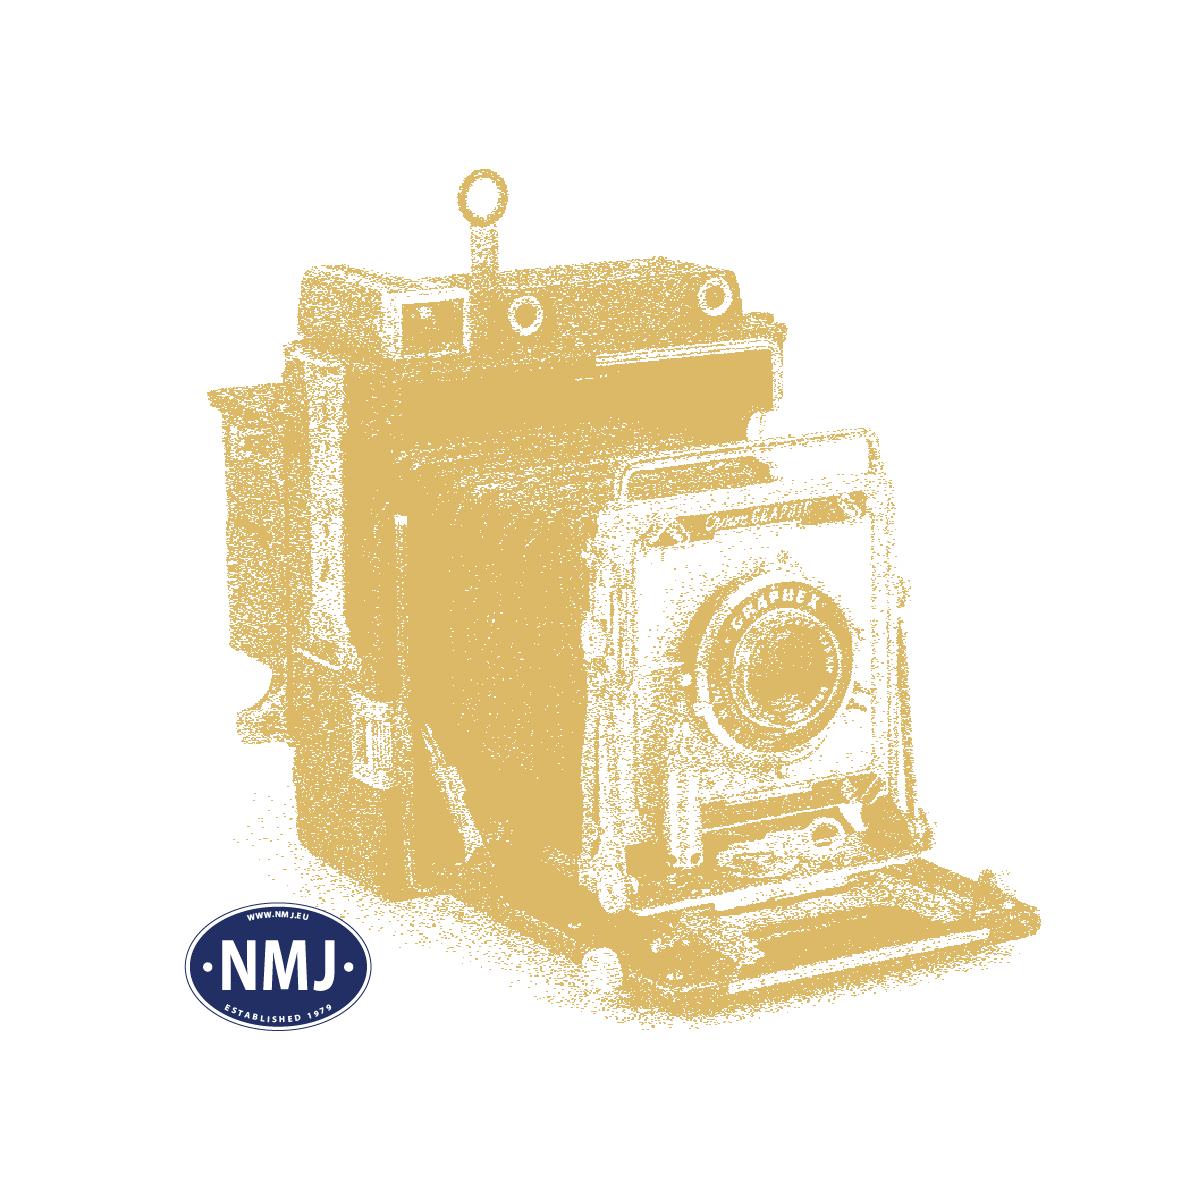 NMJT90102 - NMJ Topline DSB MY 1112, DC